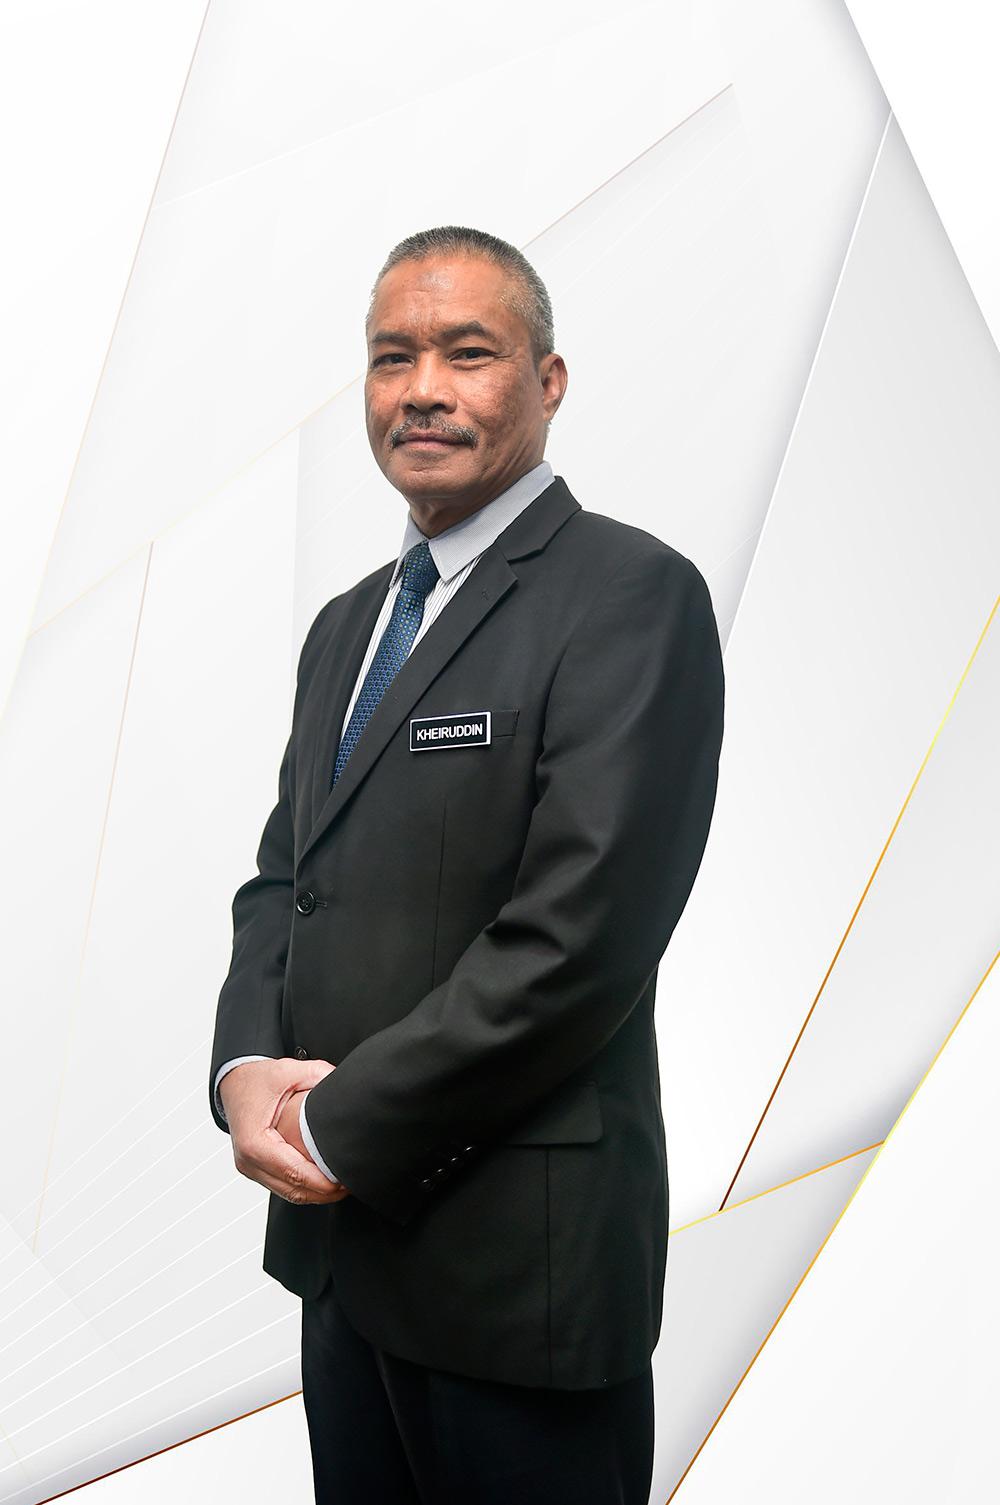 Encik Mohd Kheiruddin Mohd Rani